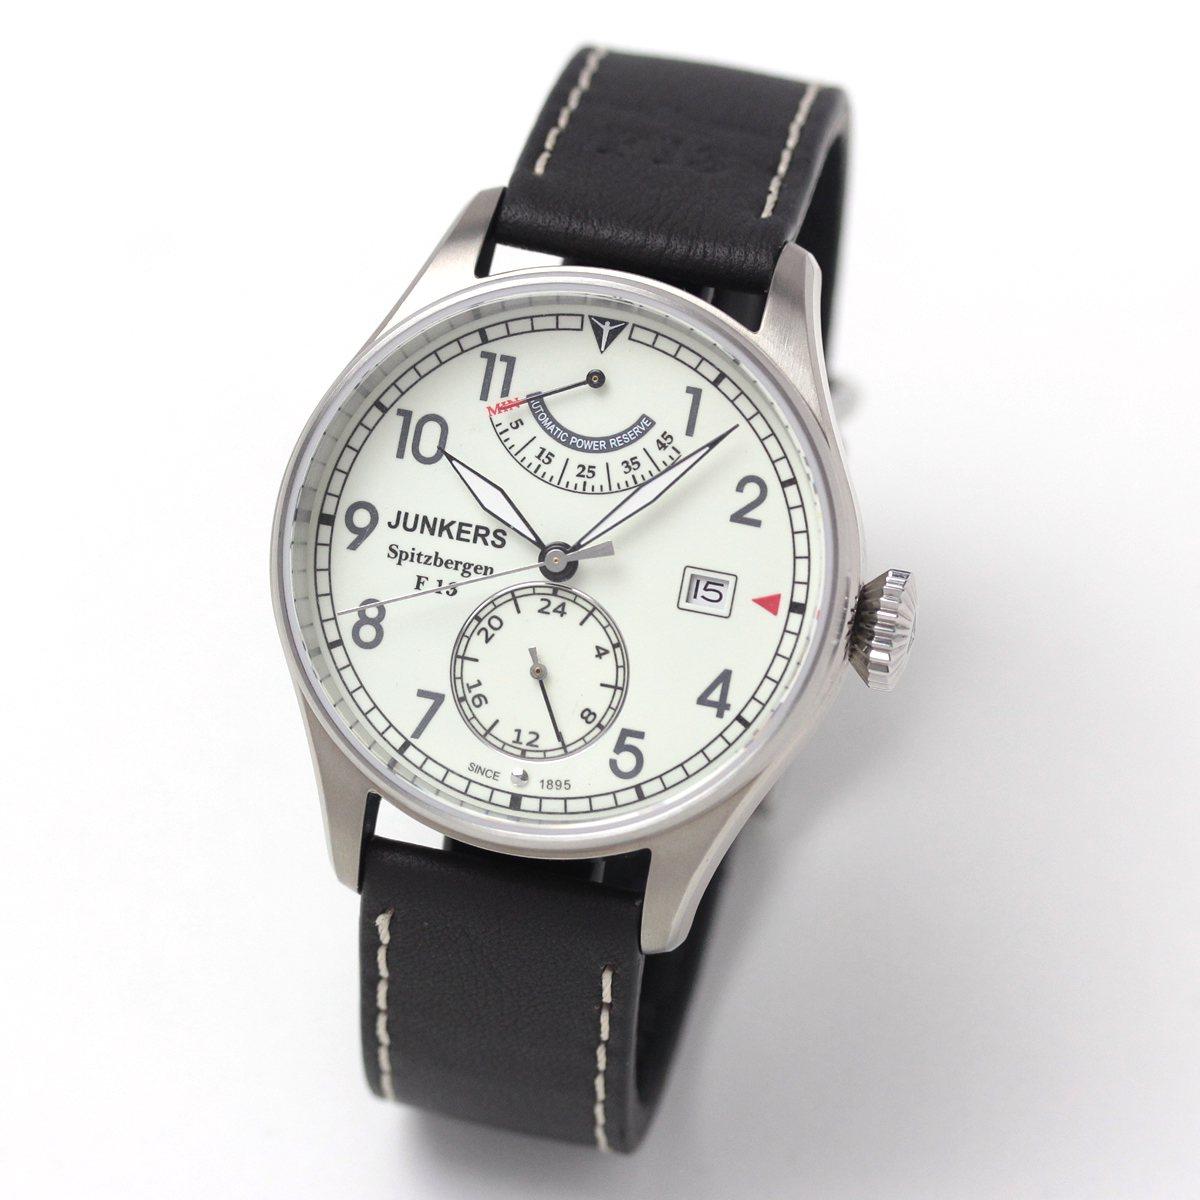 JUNKERS(ユンカース)/スピッツベルゲン F13 自動巻き 6160-5AT-203572/腕時計